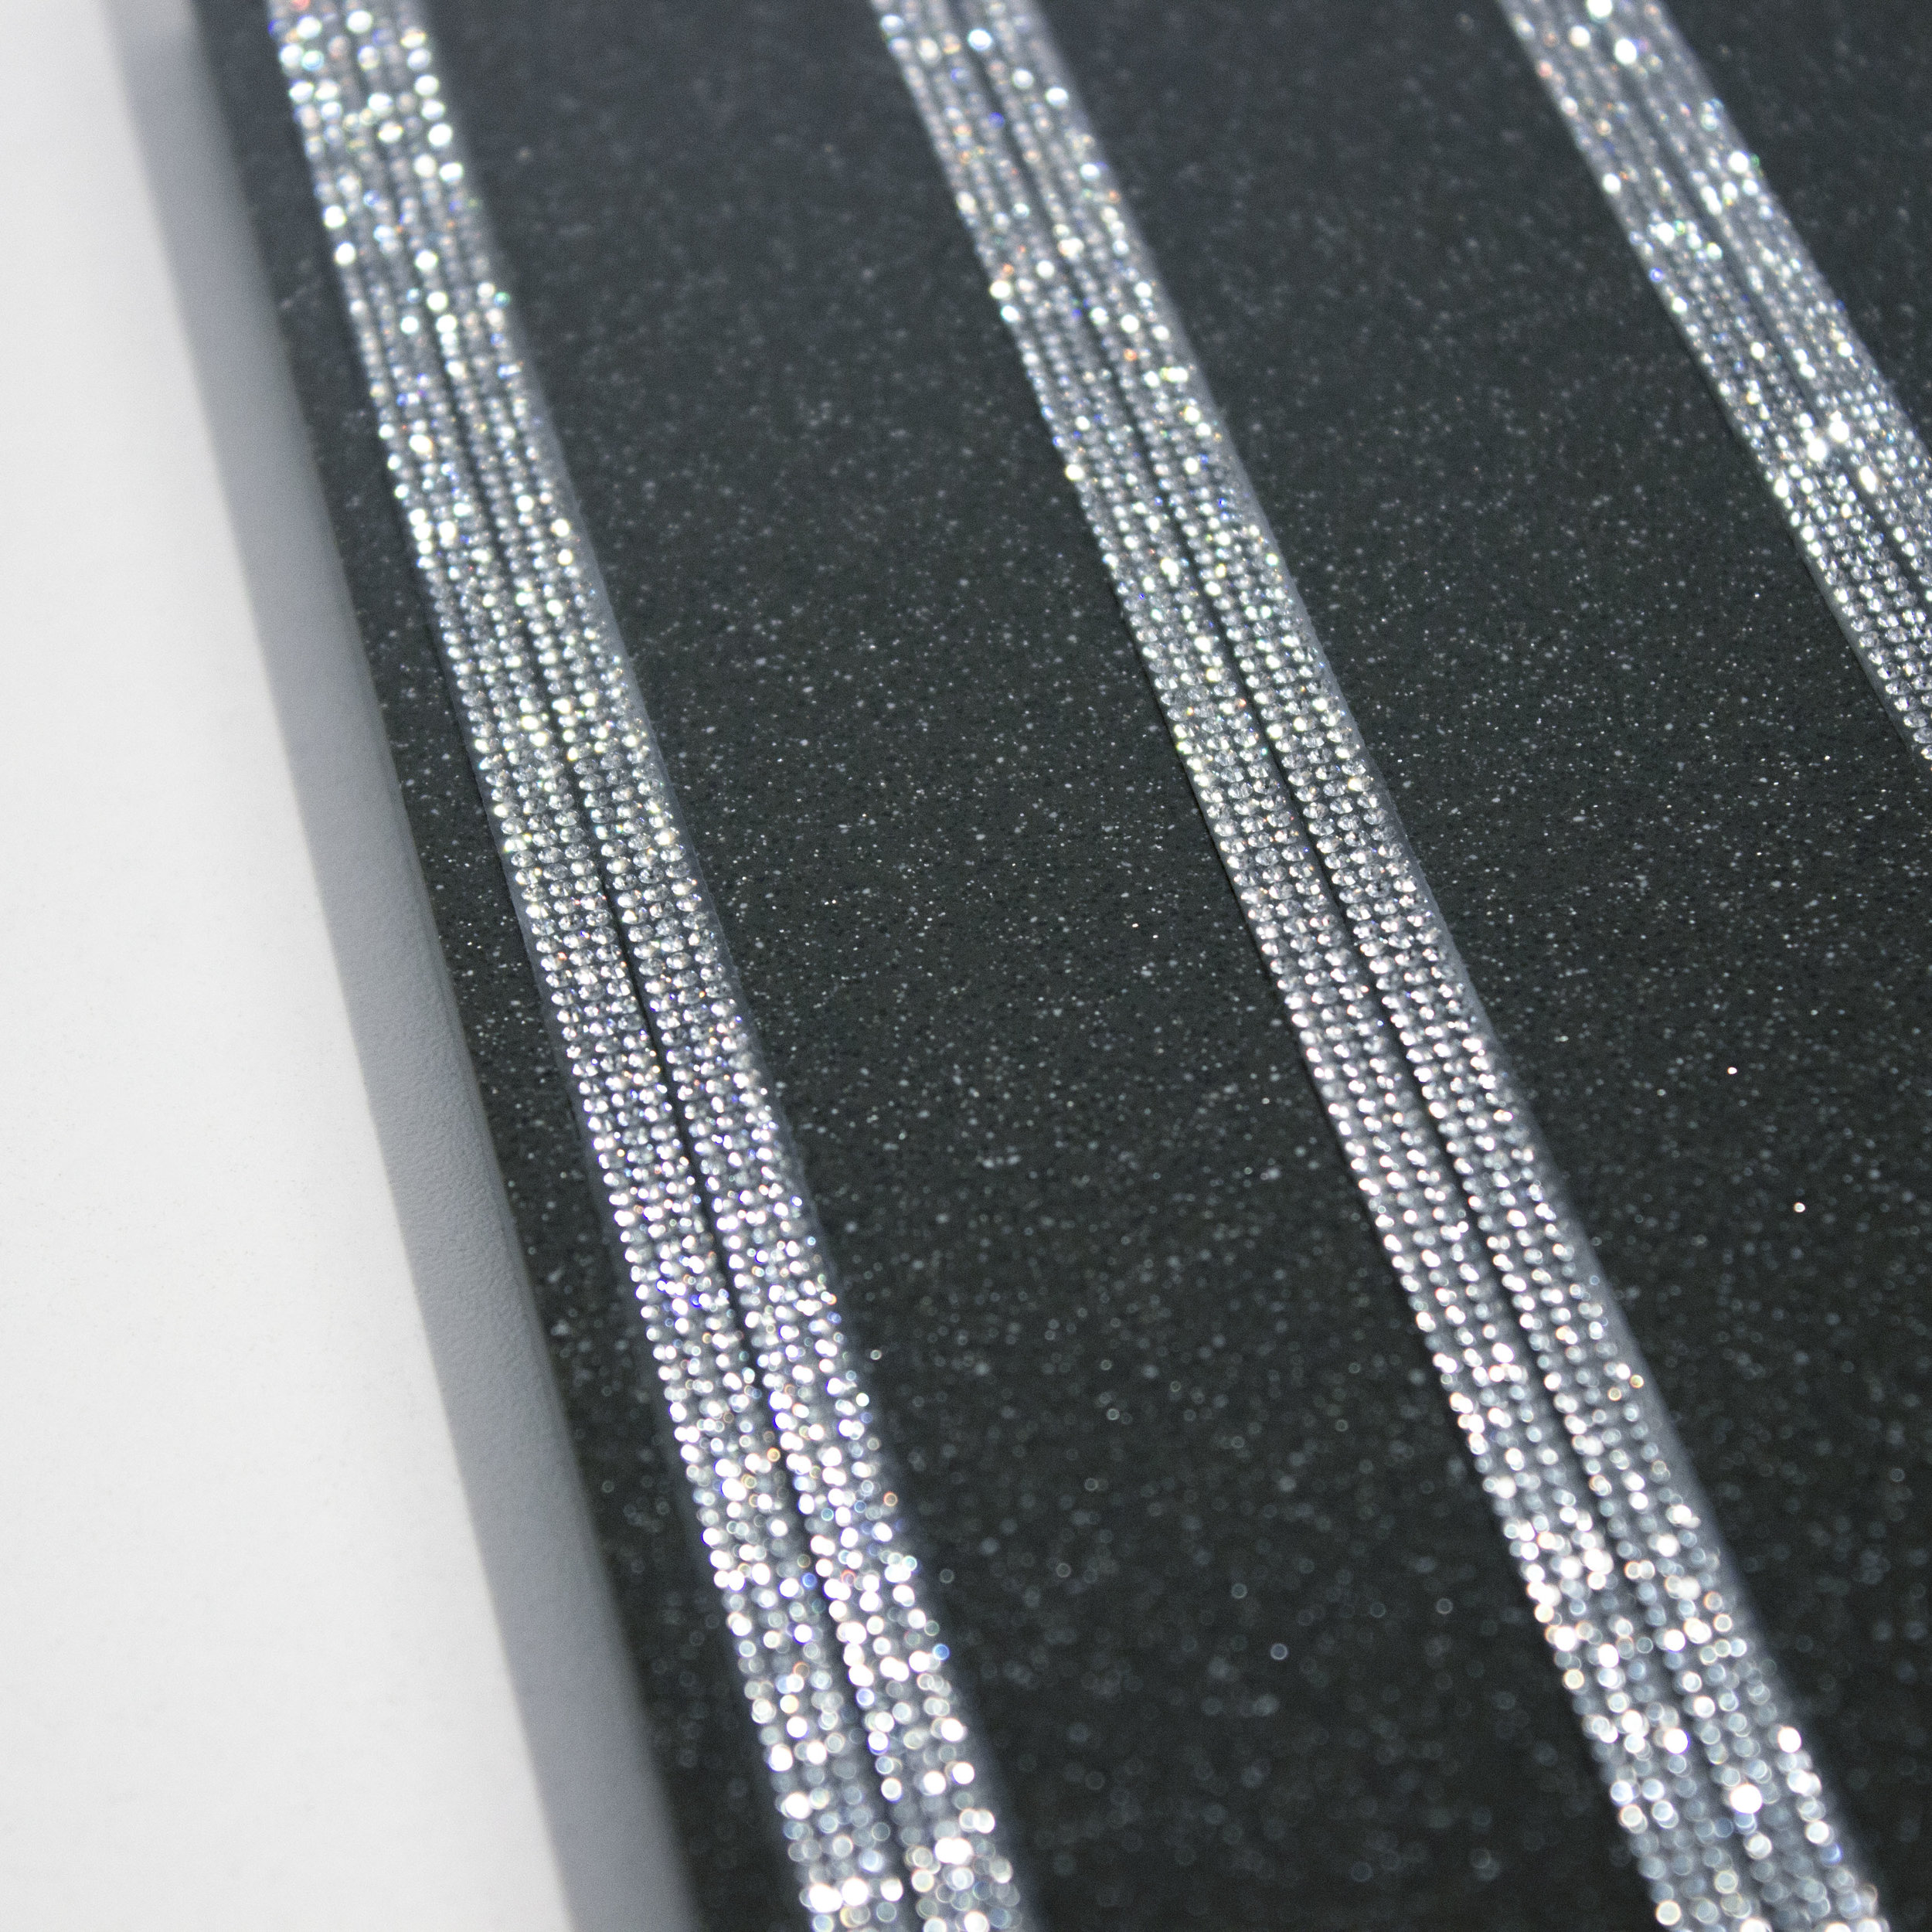 3 Crystal Bandings on Solid Surface.JPG